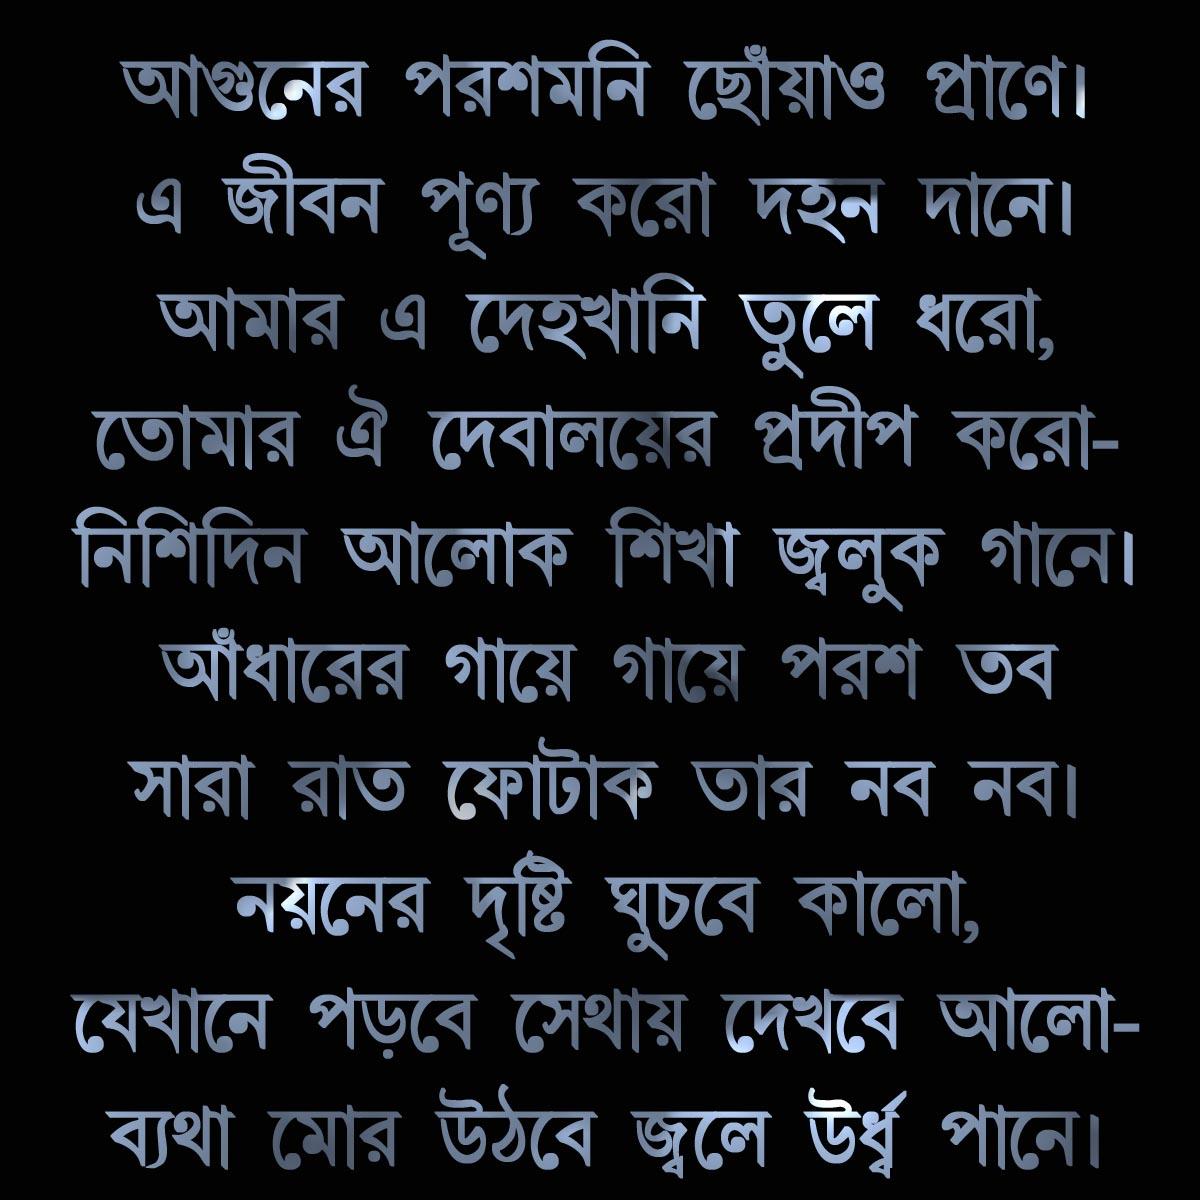 bengali shayari search results calendar 2015